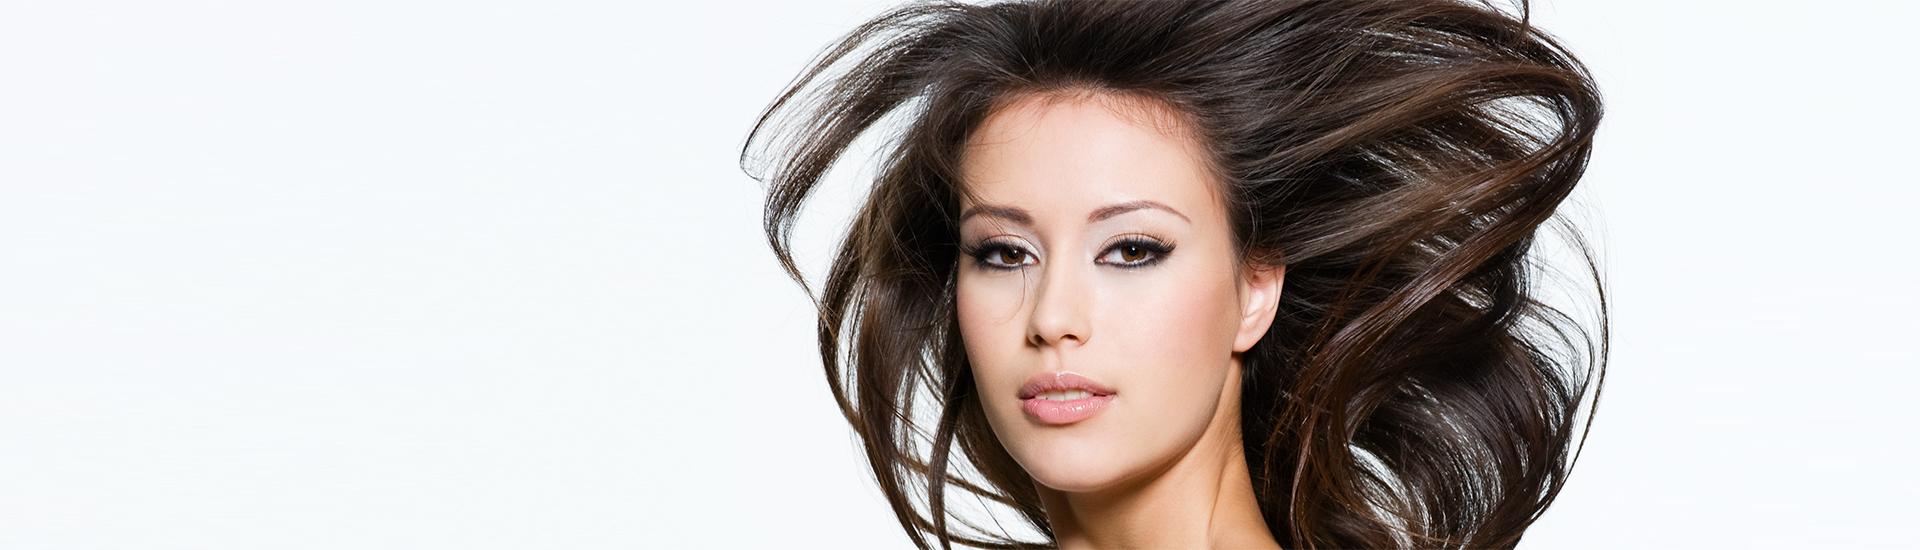 hair-design-2